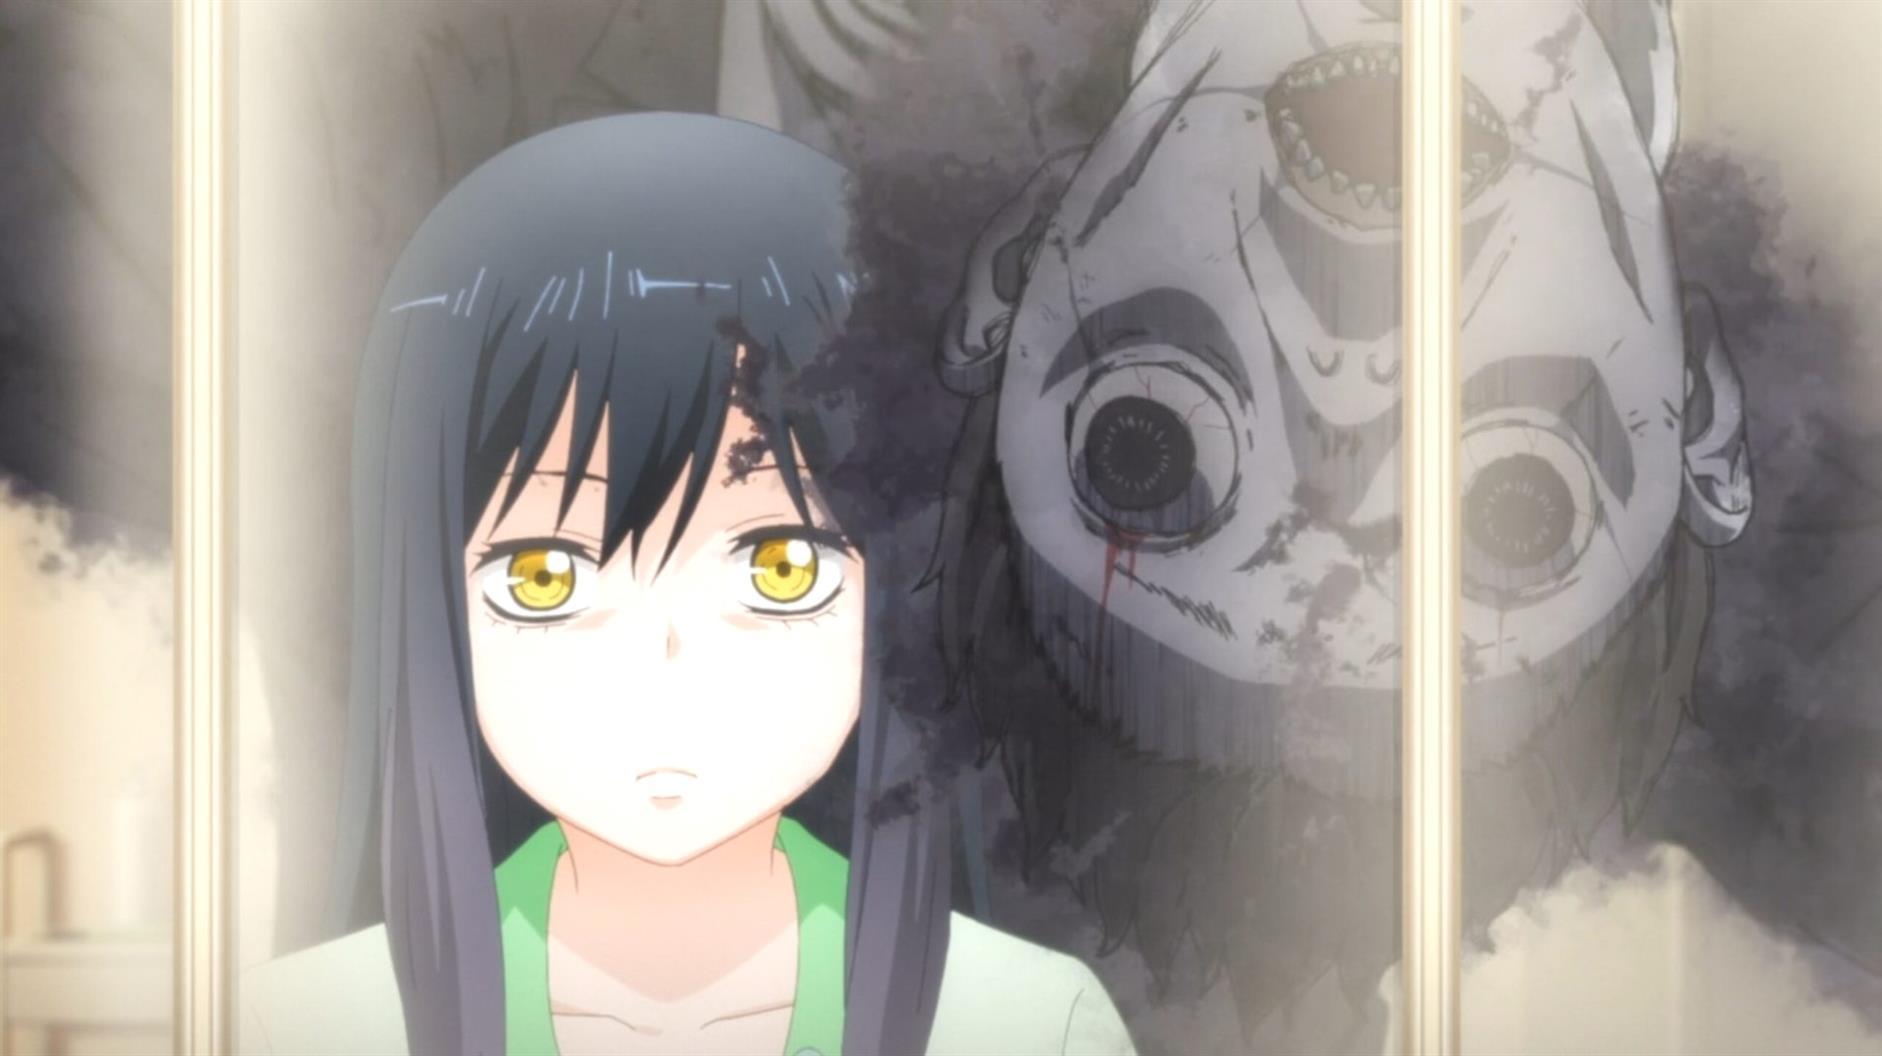 Mieruko Chan Episodio 2 Spoiler Recap Data di uscita e Orario 8P0bYR 1 1